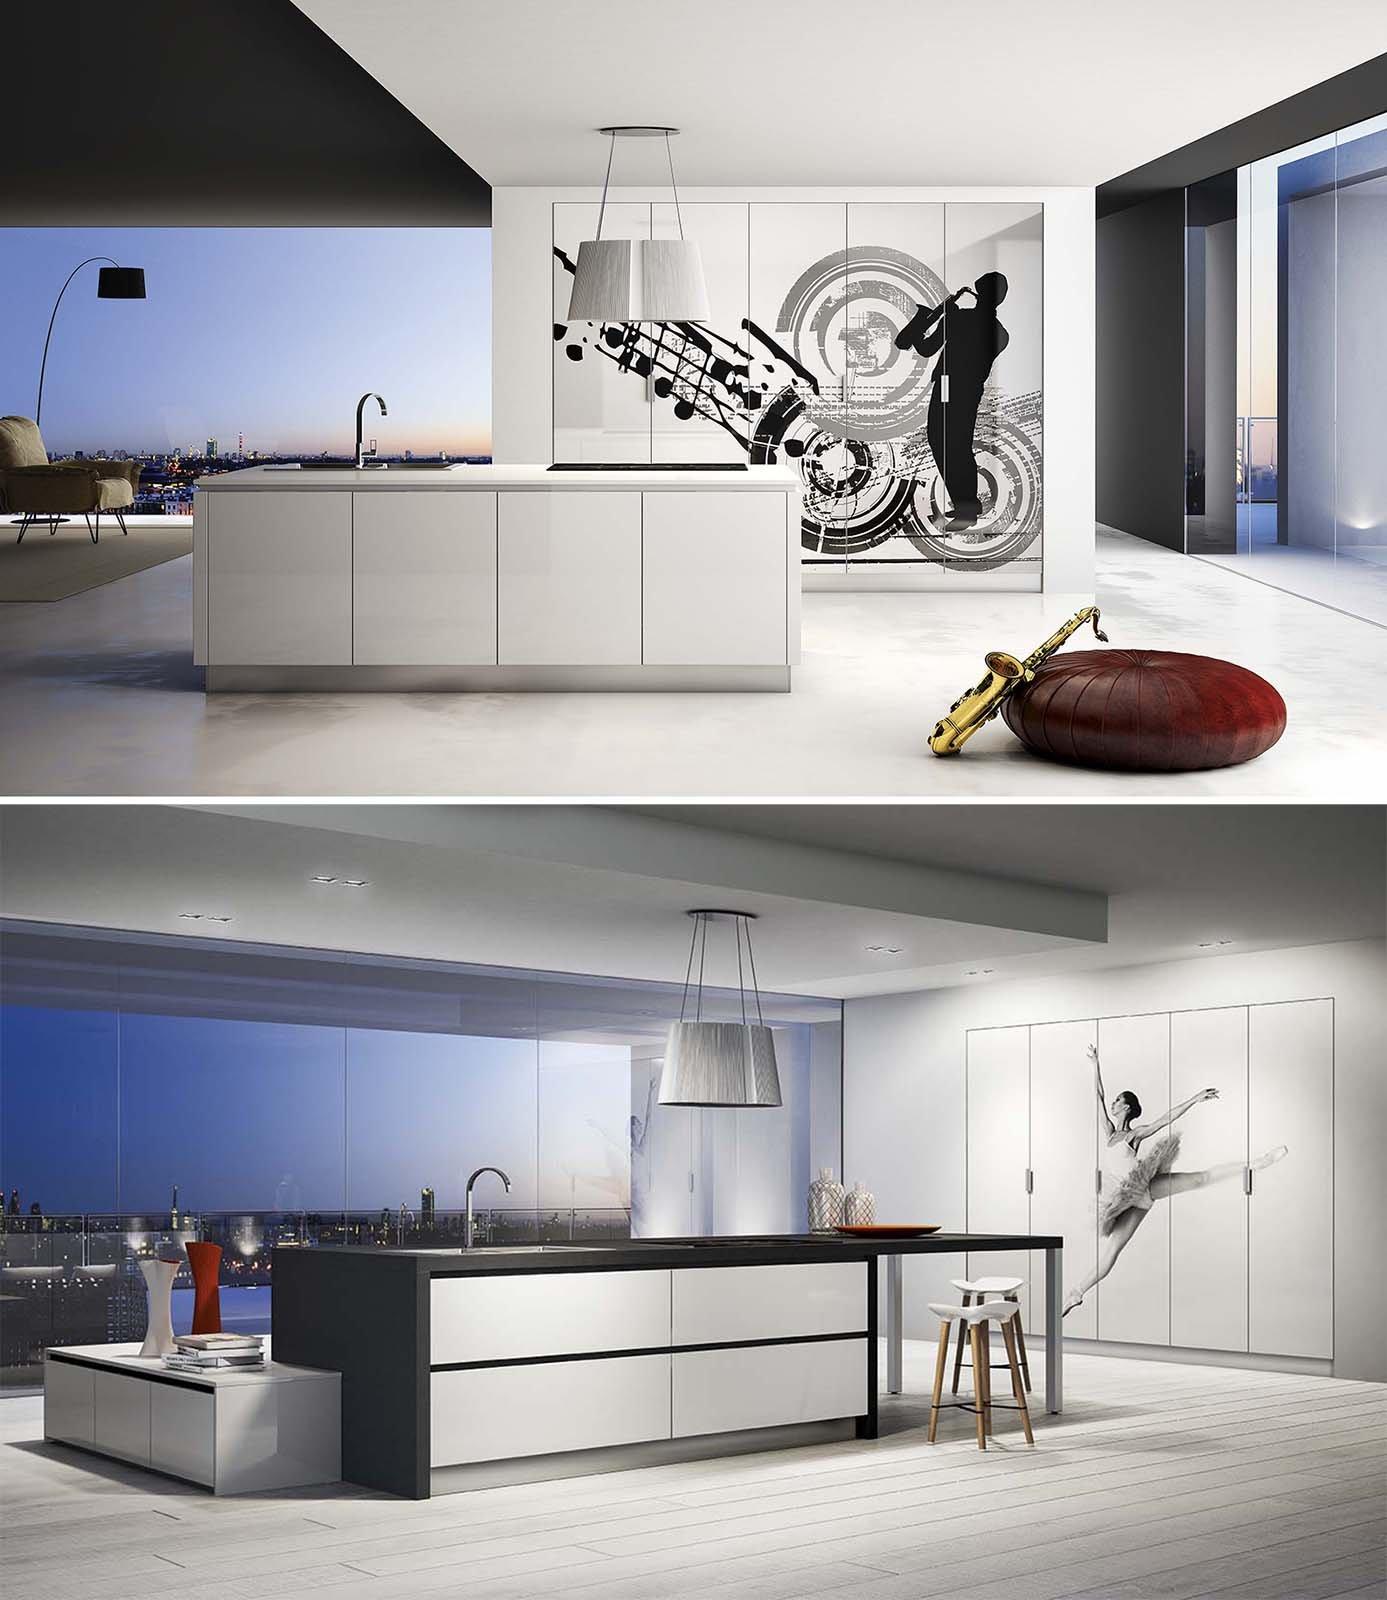 Cucine decorate per un ambiente originale e vivace - Cose di Casa